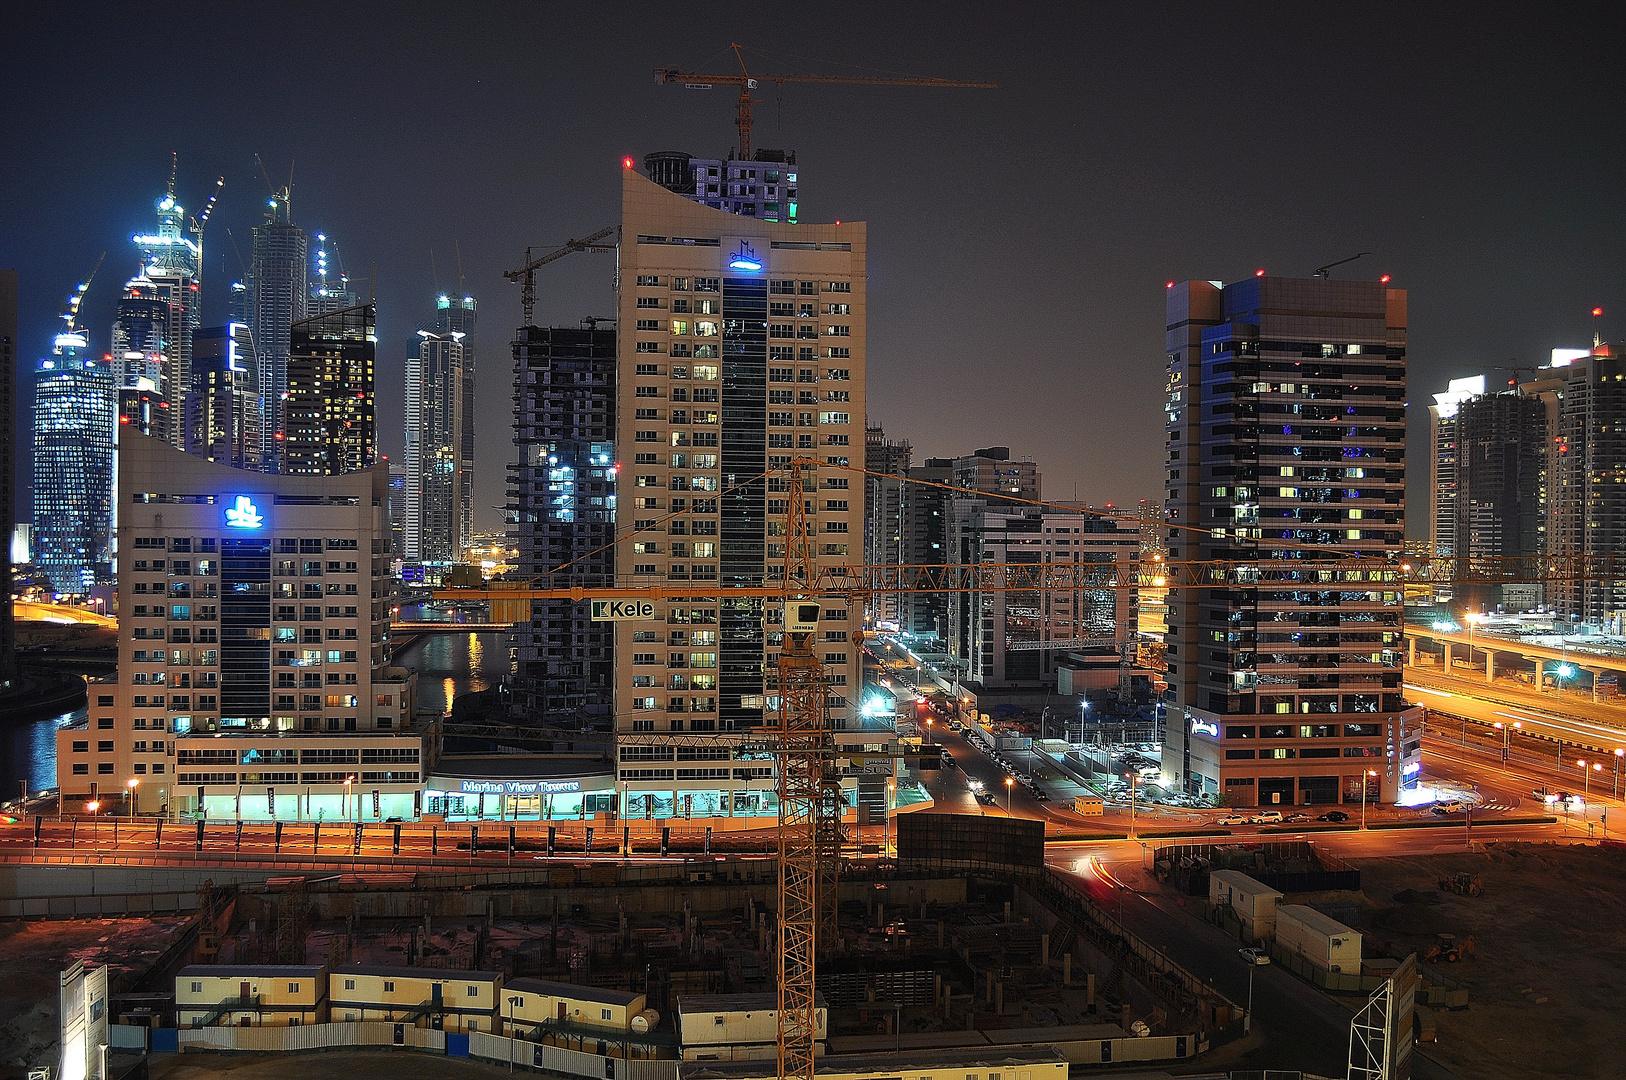 Dubai Marina - Grundstein Tower